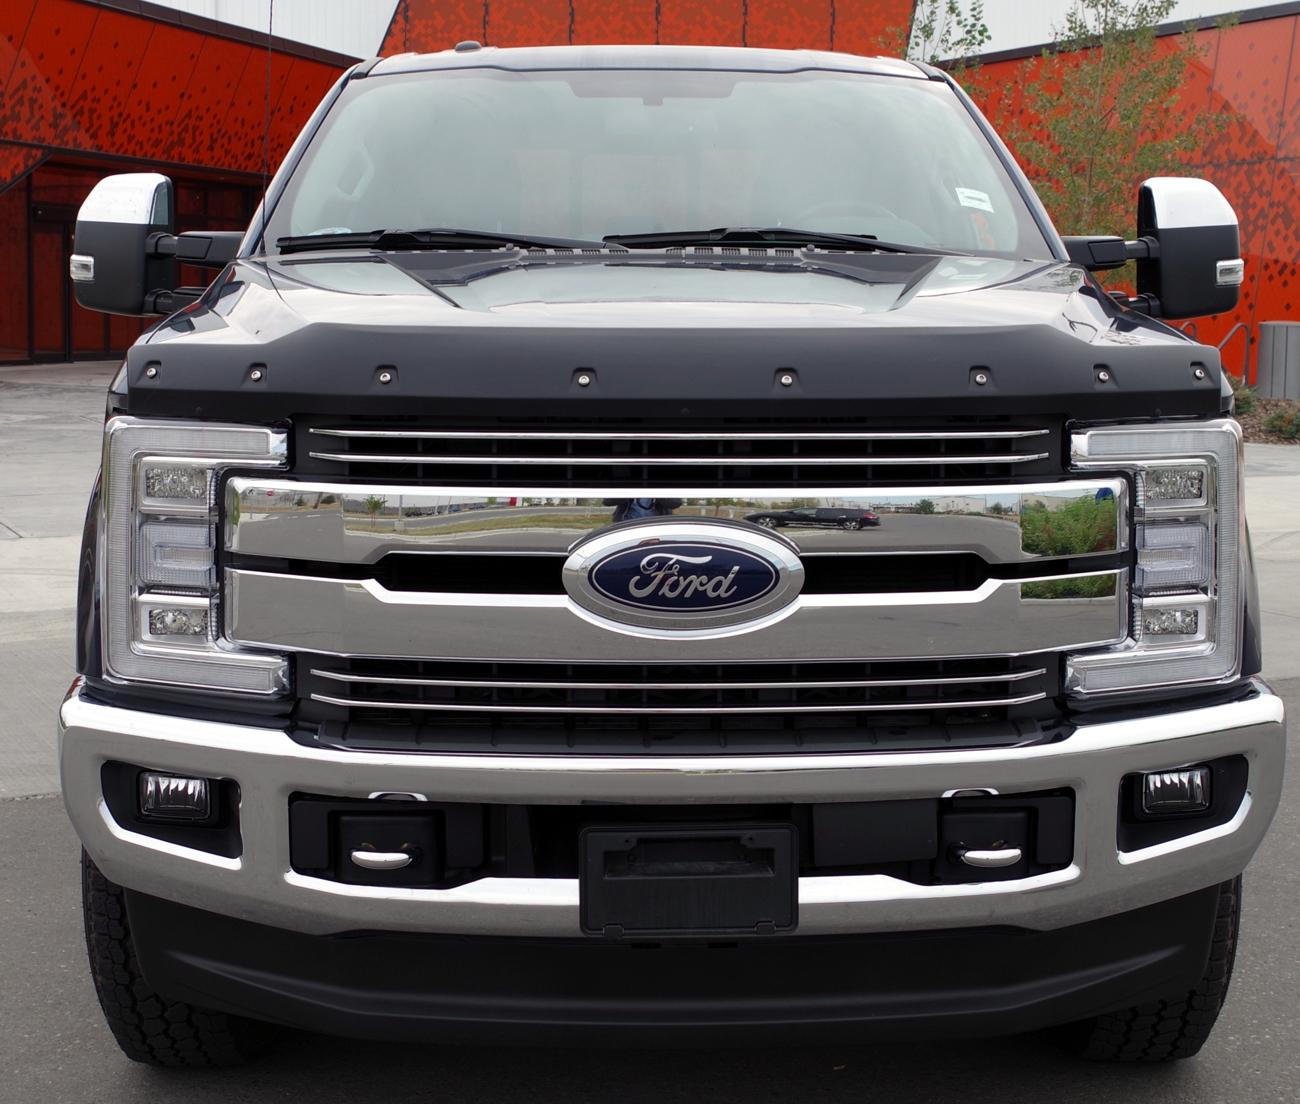 Ford Super Duty (2017-2019) Textured Tough Guard